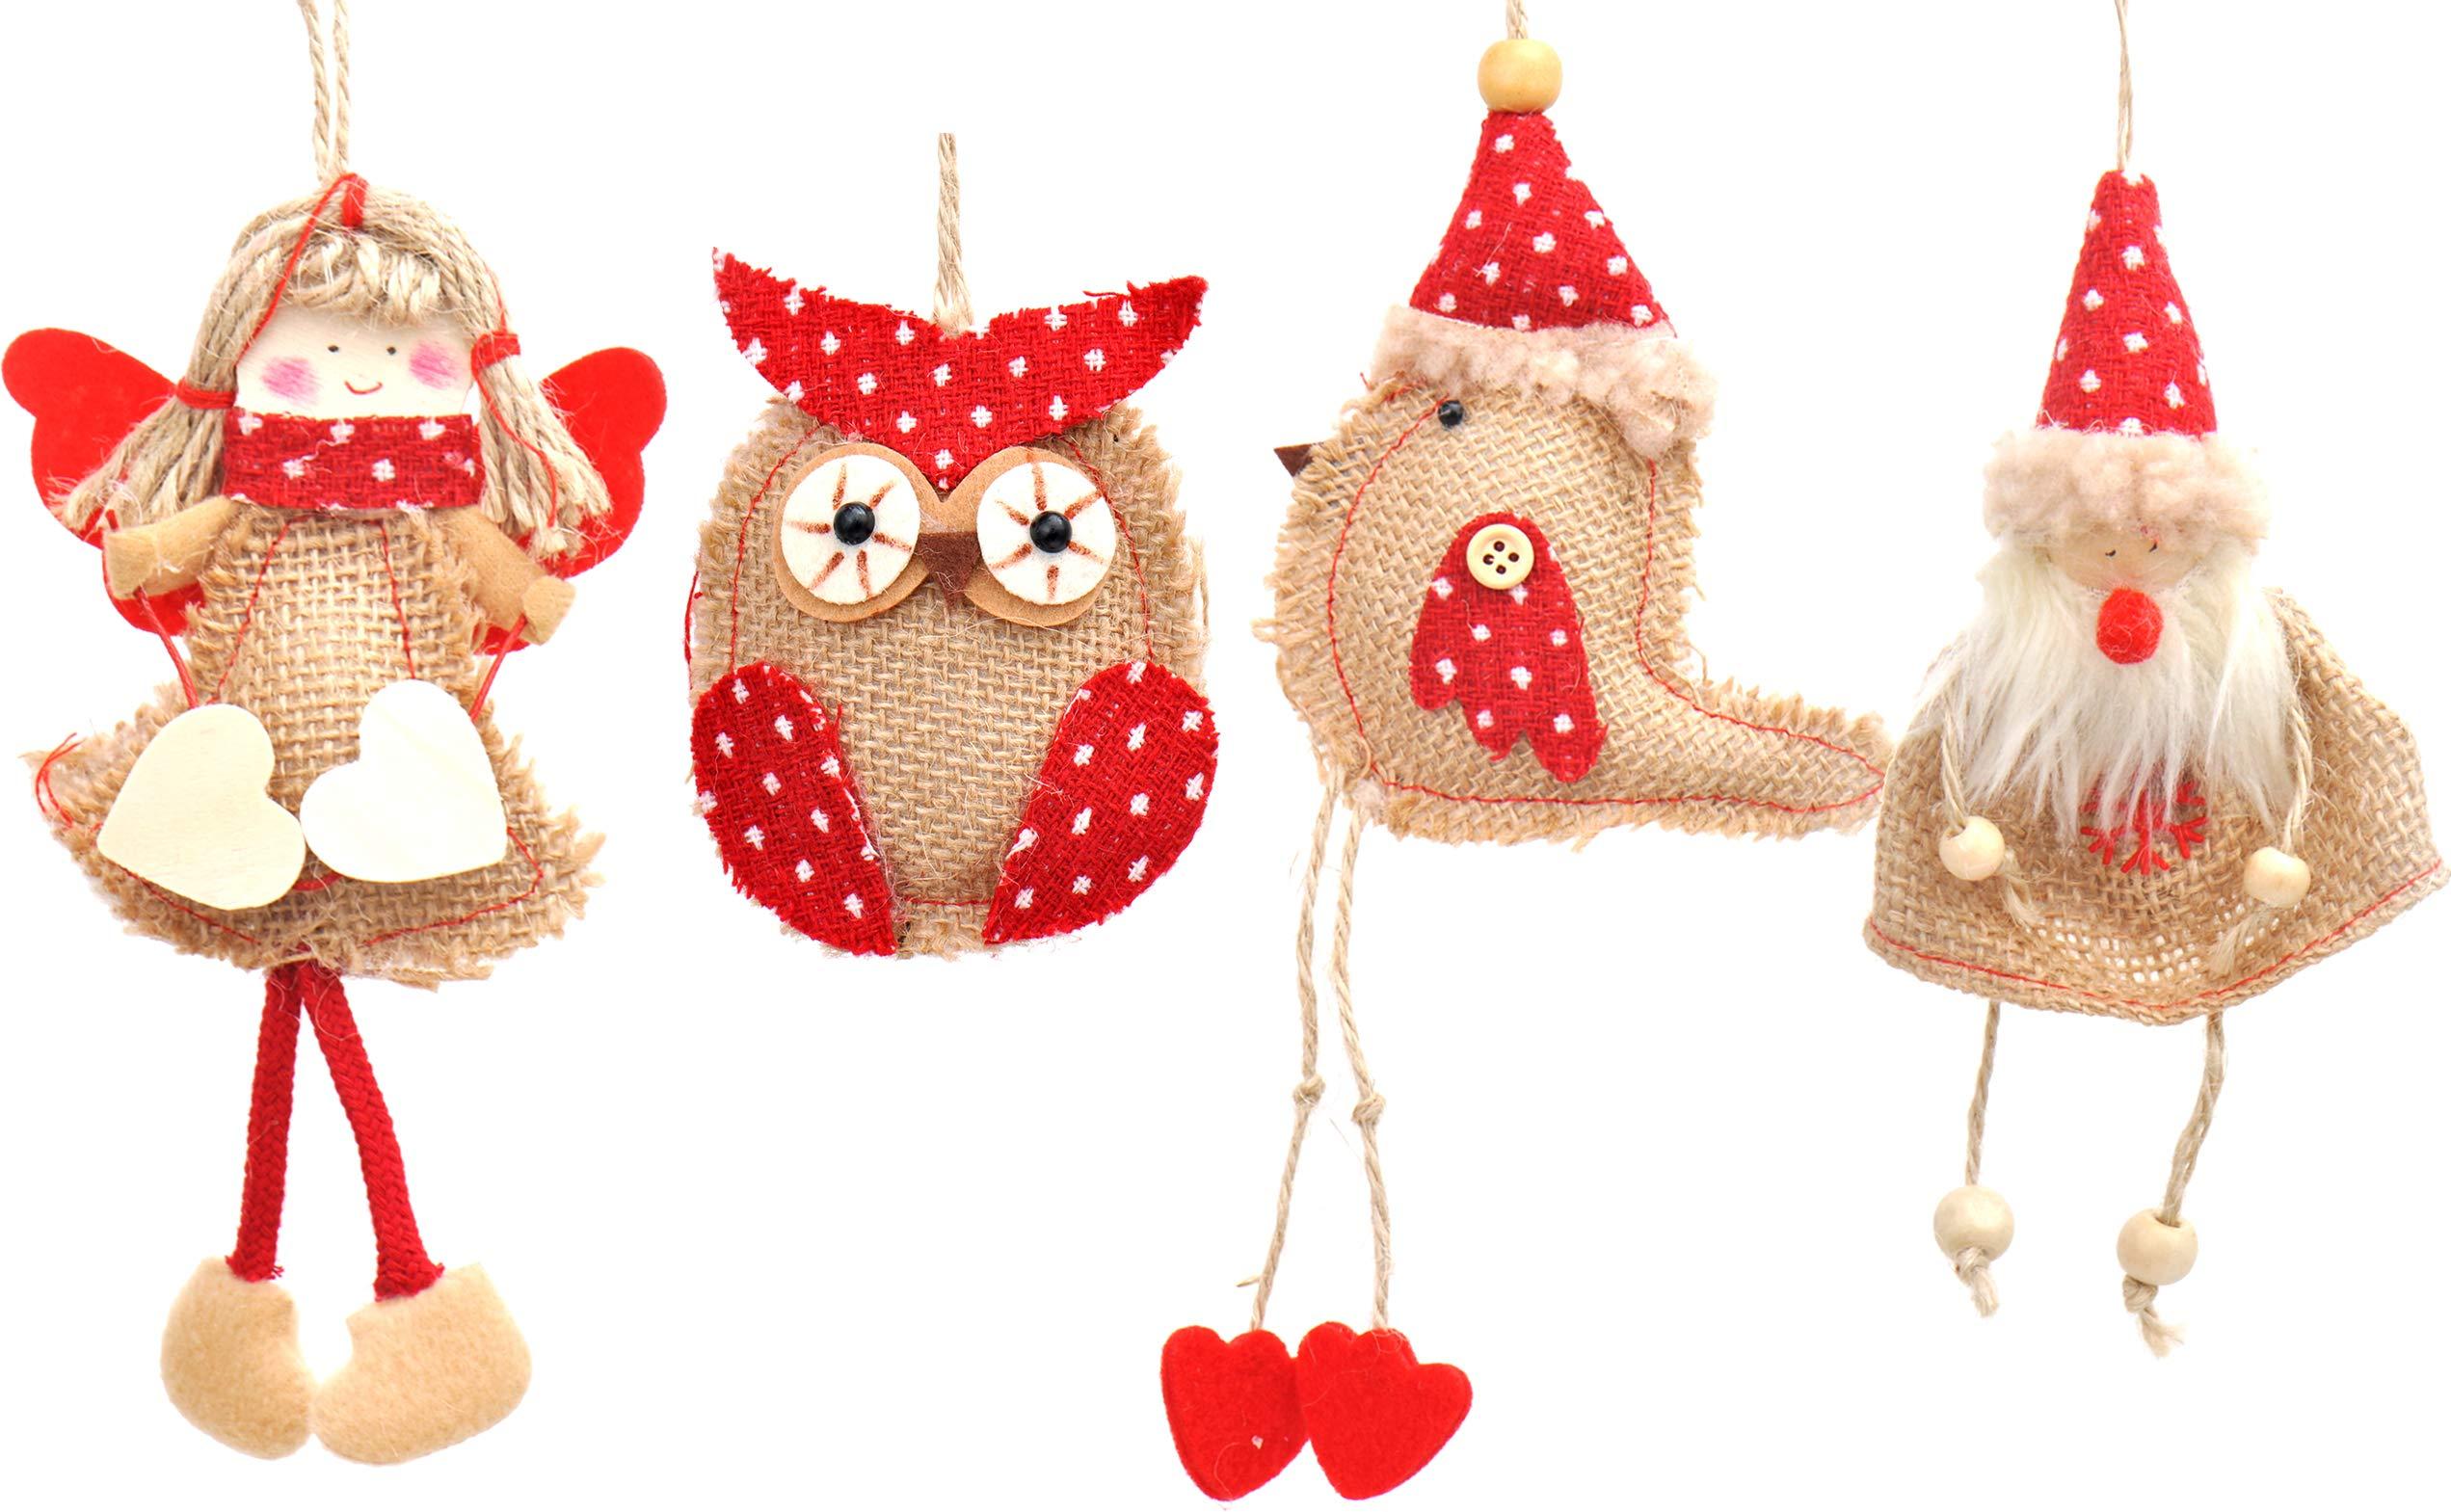 MoShelly Christmas Bell Tree Holiday Party 8pcs Rustic Burlap Owl/Bird/Santa Claus/Angel